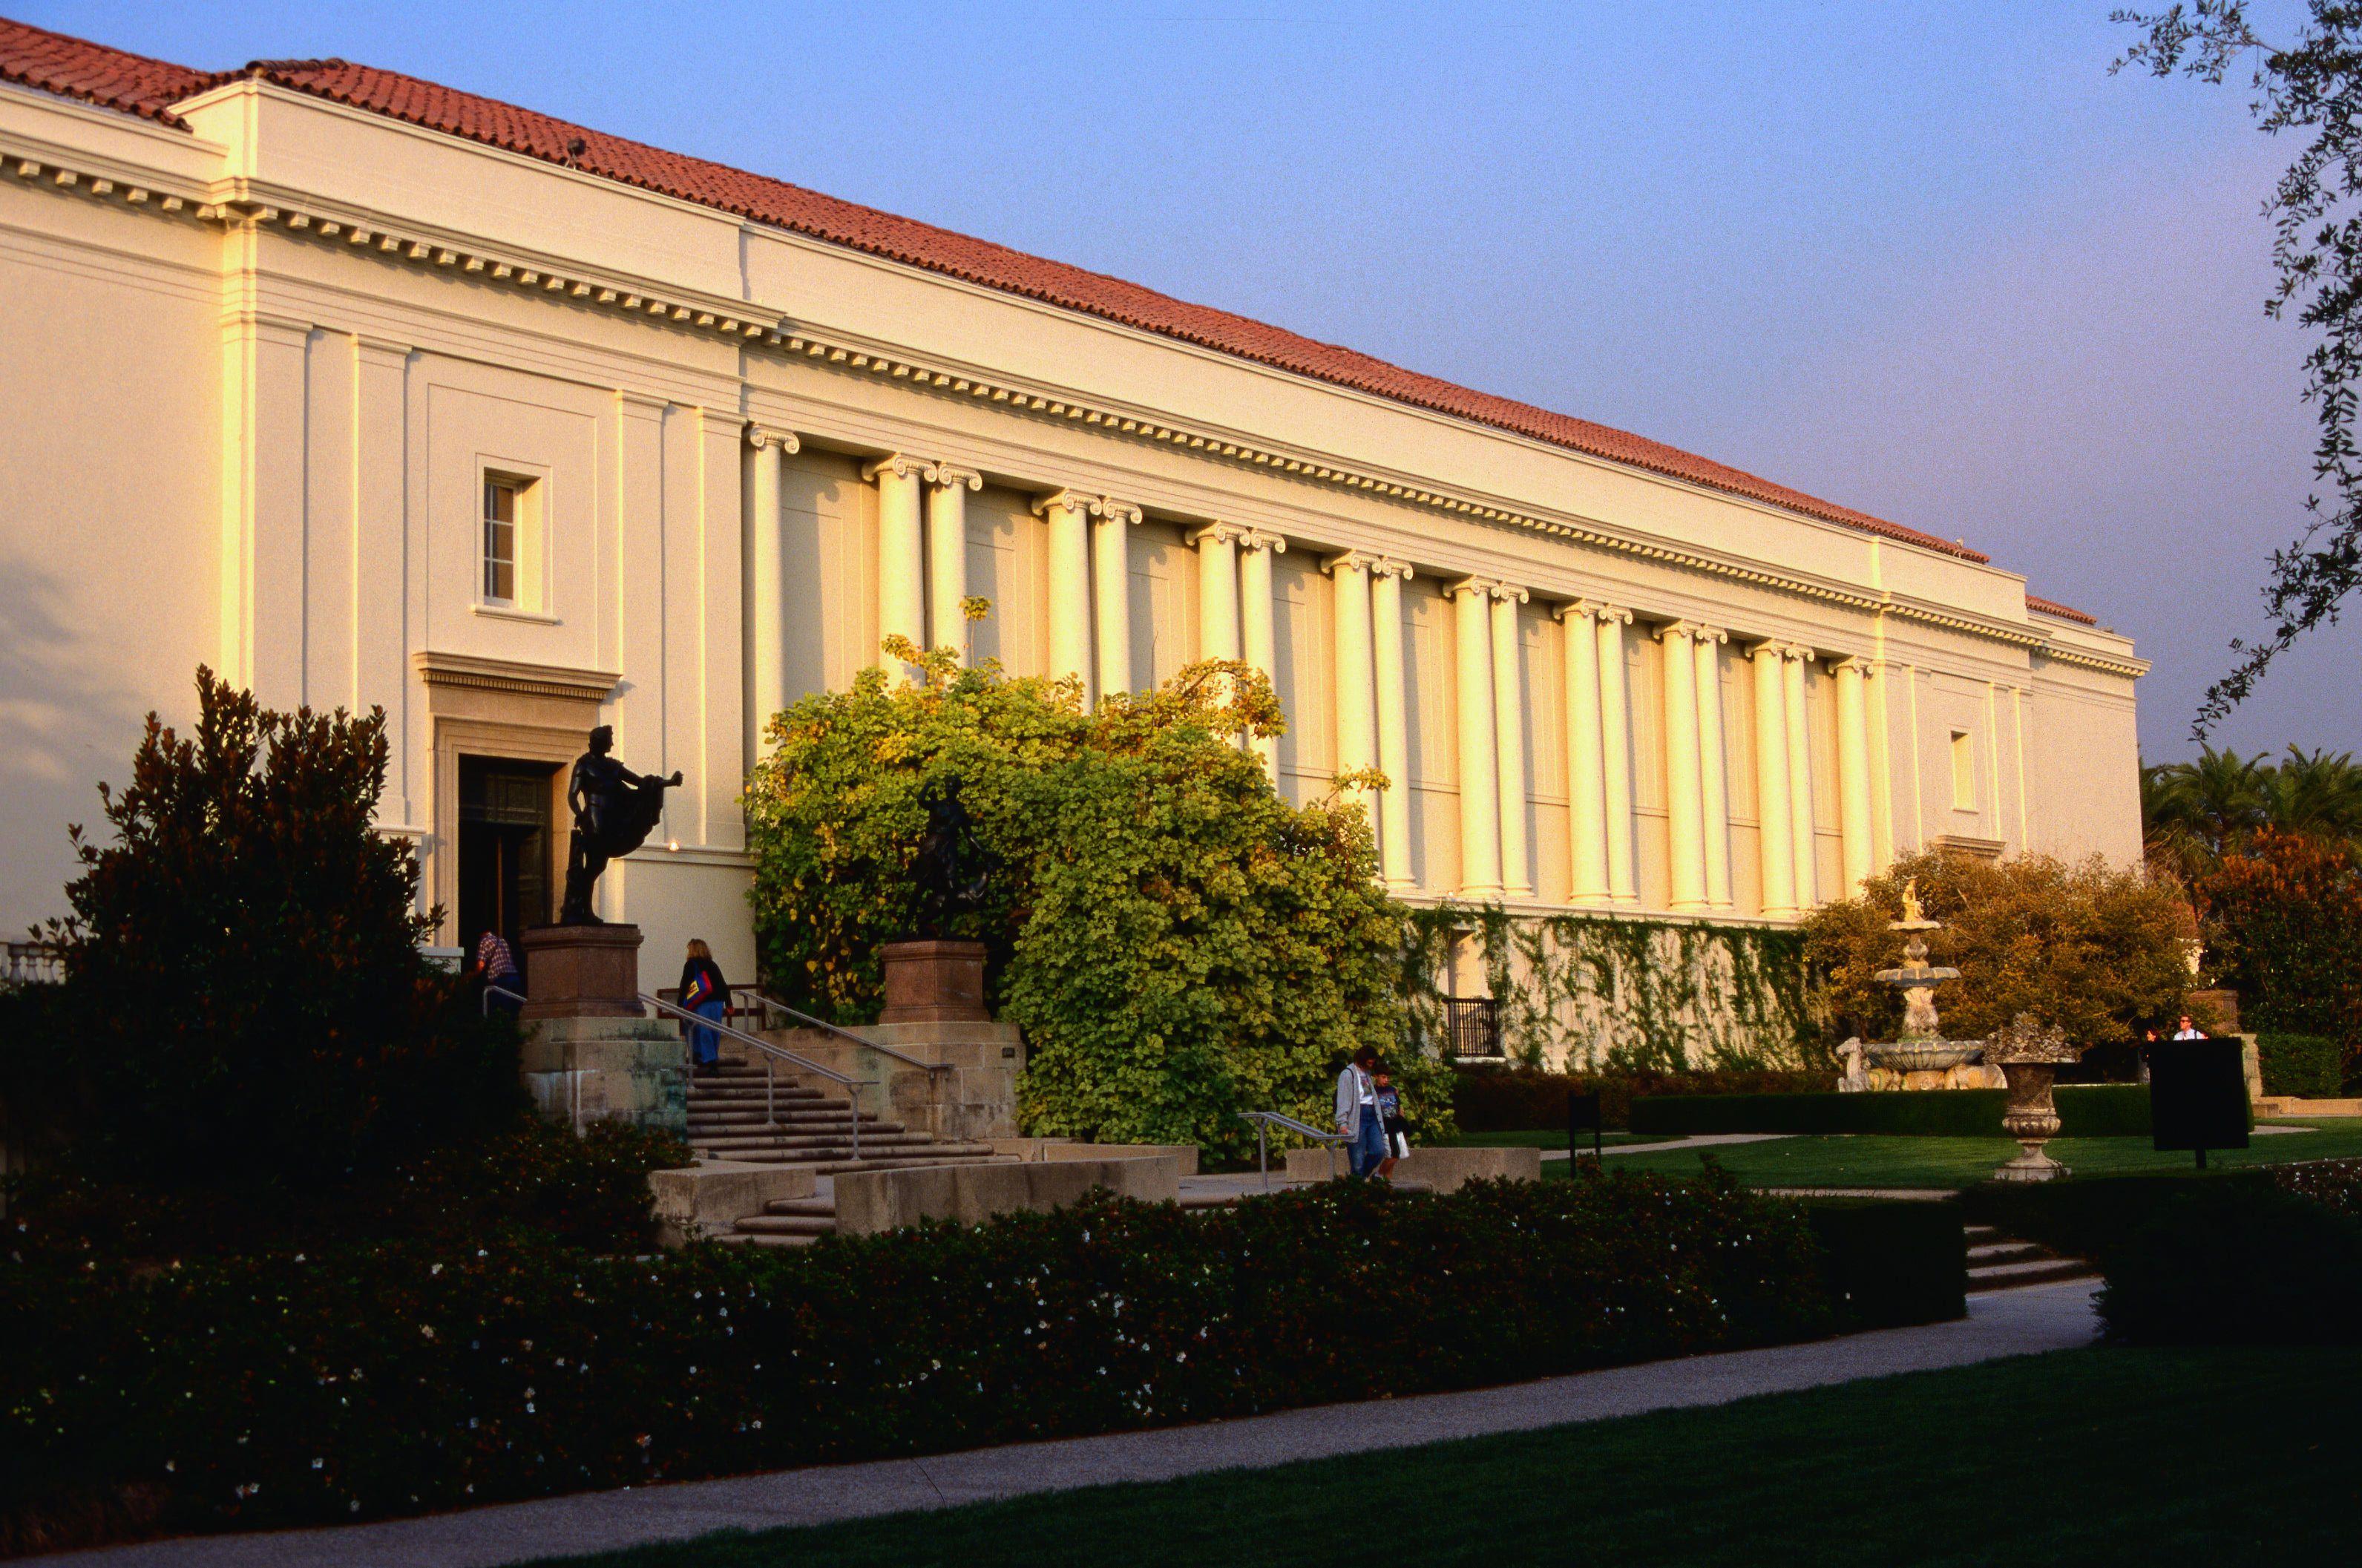 The Huntington Library - Huntington Beach, California